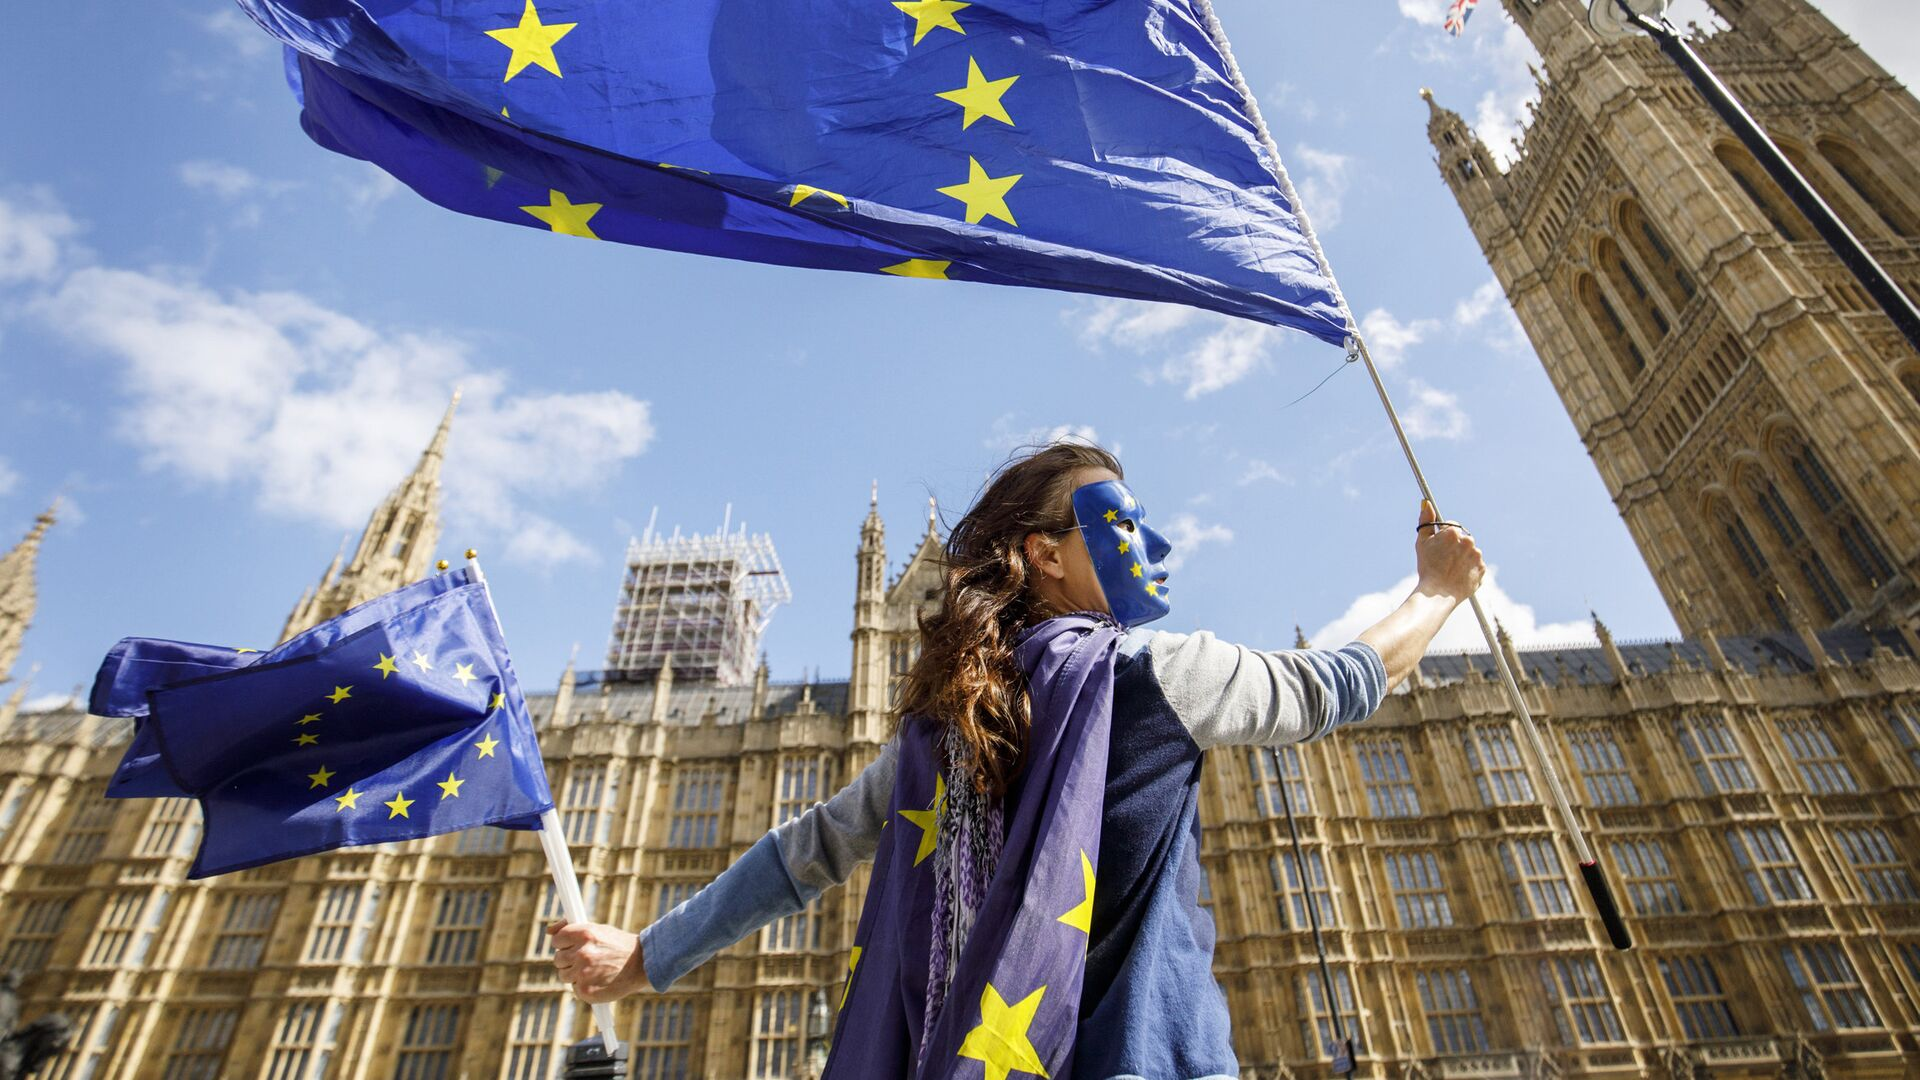 Акция протеста против прекращения членства Великобритании в ЕС у здания парламента в Лондоне - РИА Новости, 1920, 24.07.2020